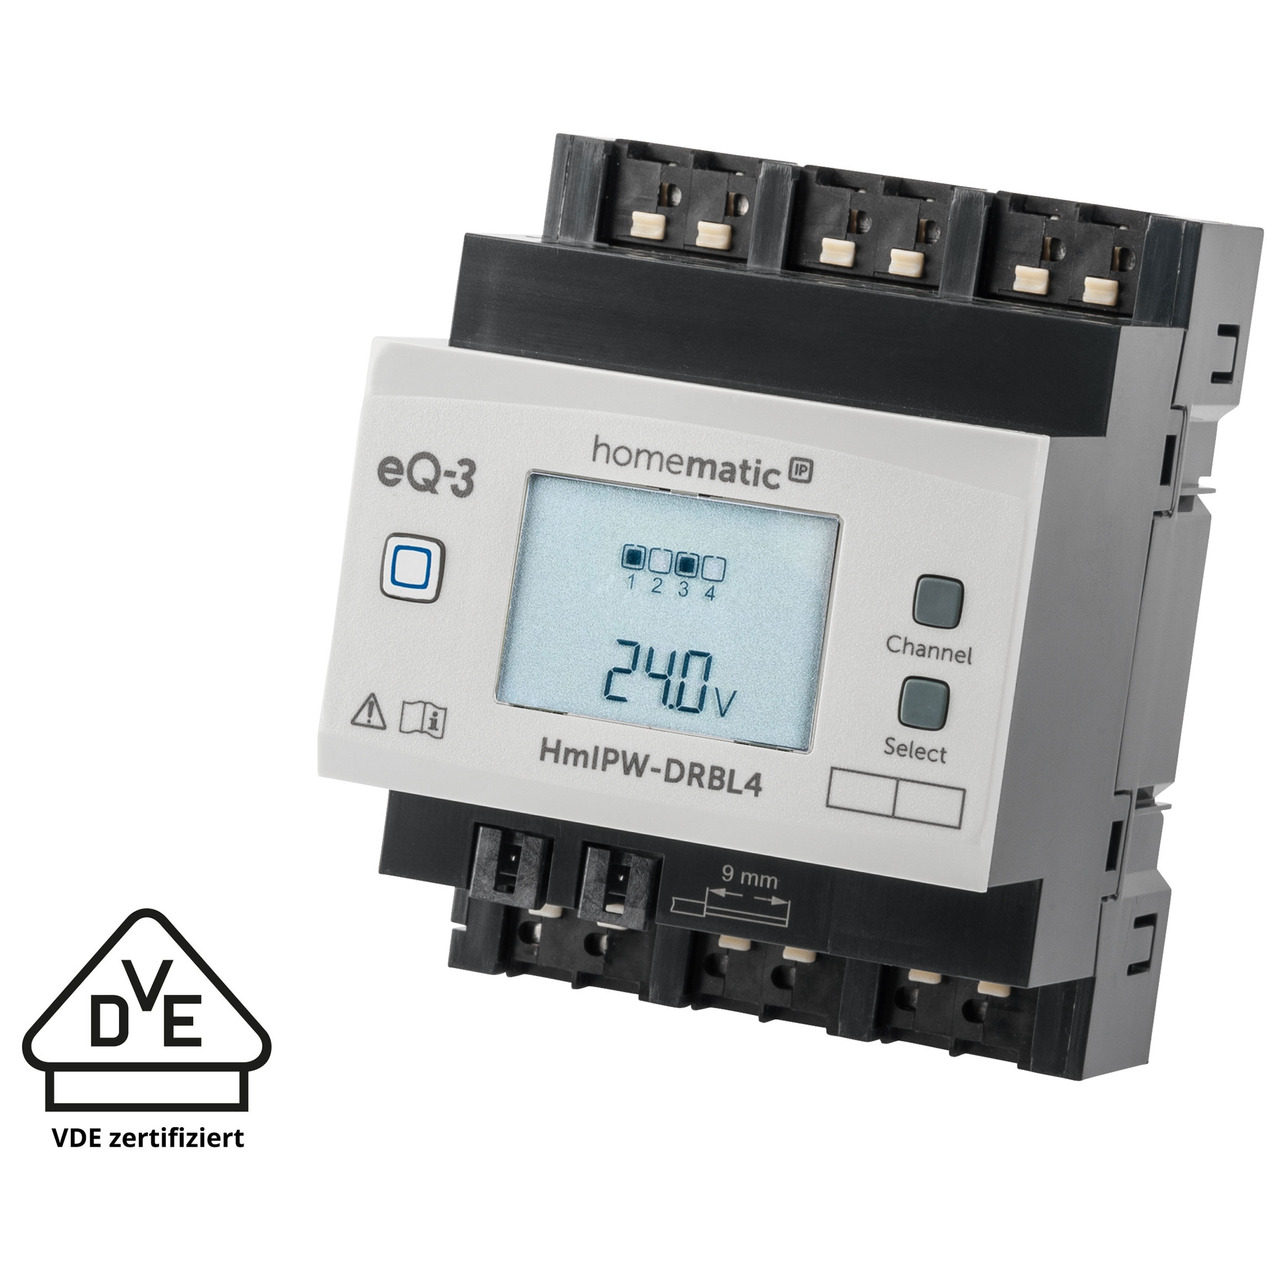 Homematic IP Wired Smart Home 4-fach-Jalousie-Rollladenaktor HmIPW-DRBL4- VDE zertifiziert